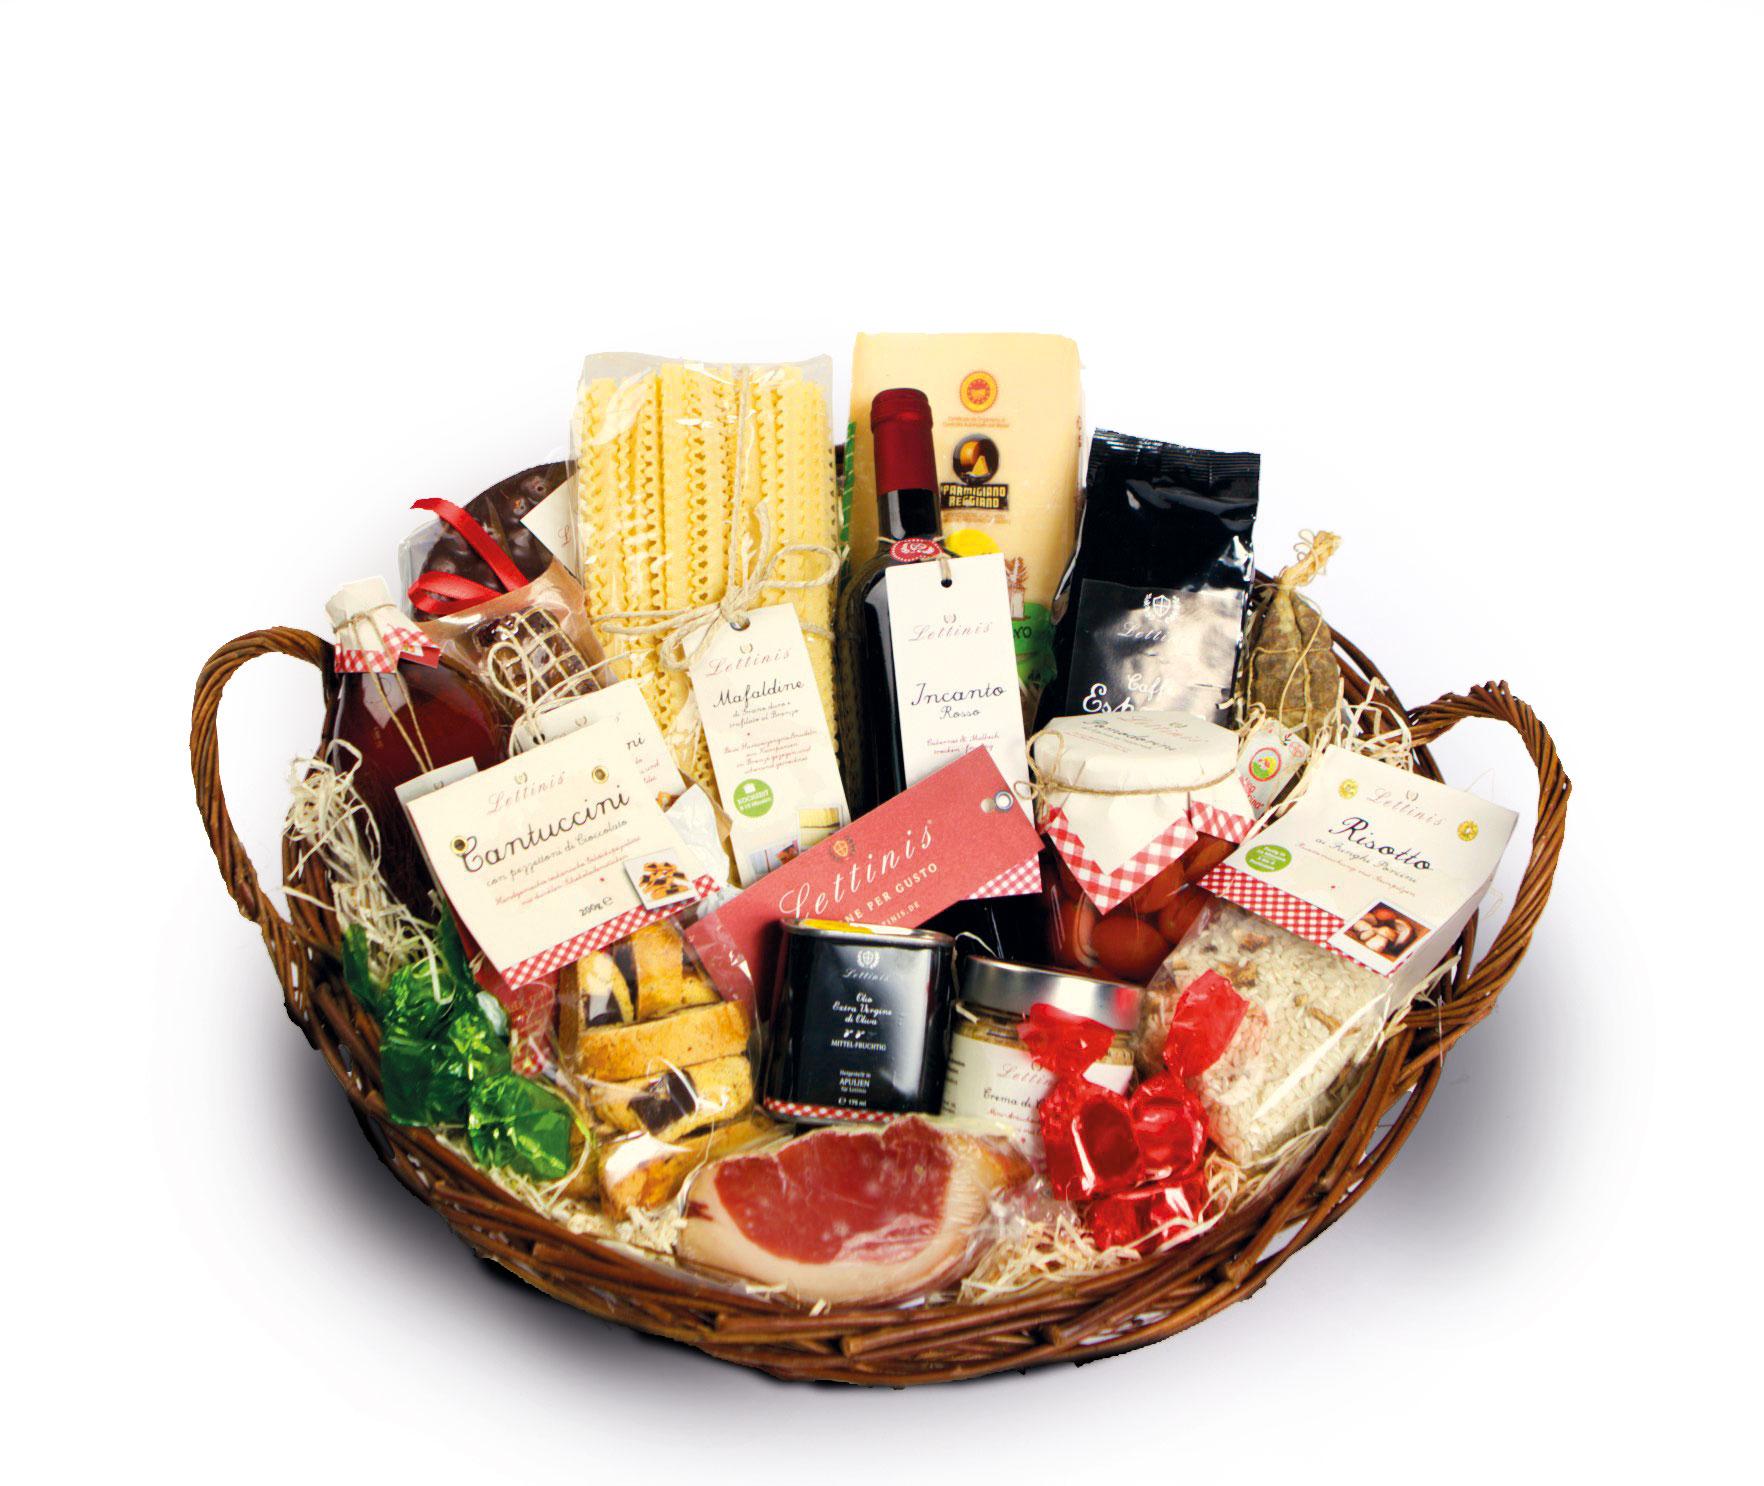 Italienischer Geschenkkorb Bella Figura Alles Fur Den Grossen Genuss Aus Italien Geschenkkorb Prasentkorb Kulinarische Geschenke